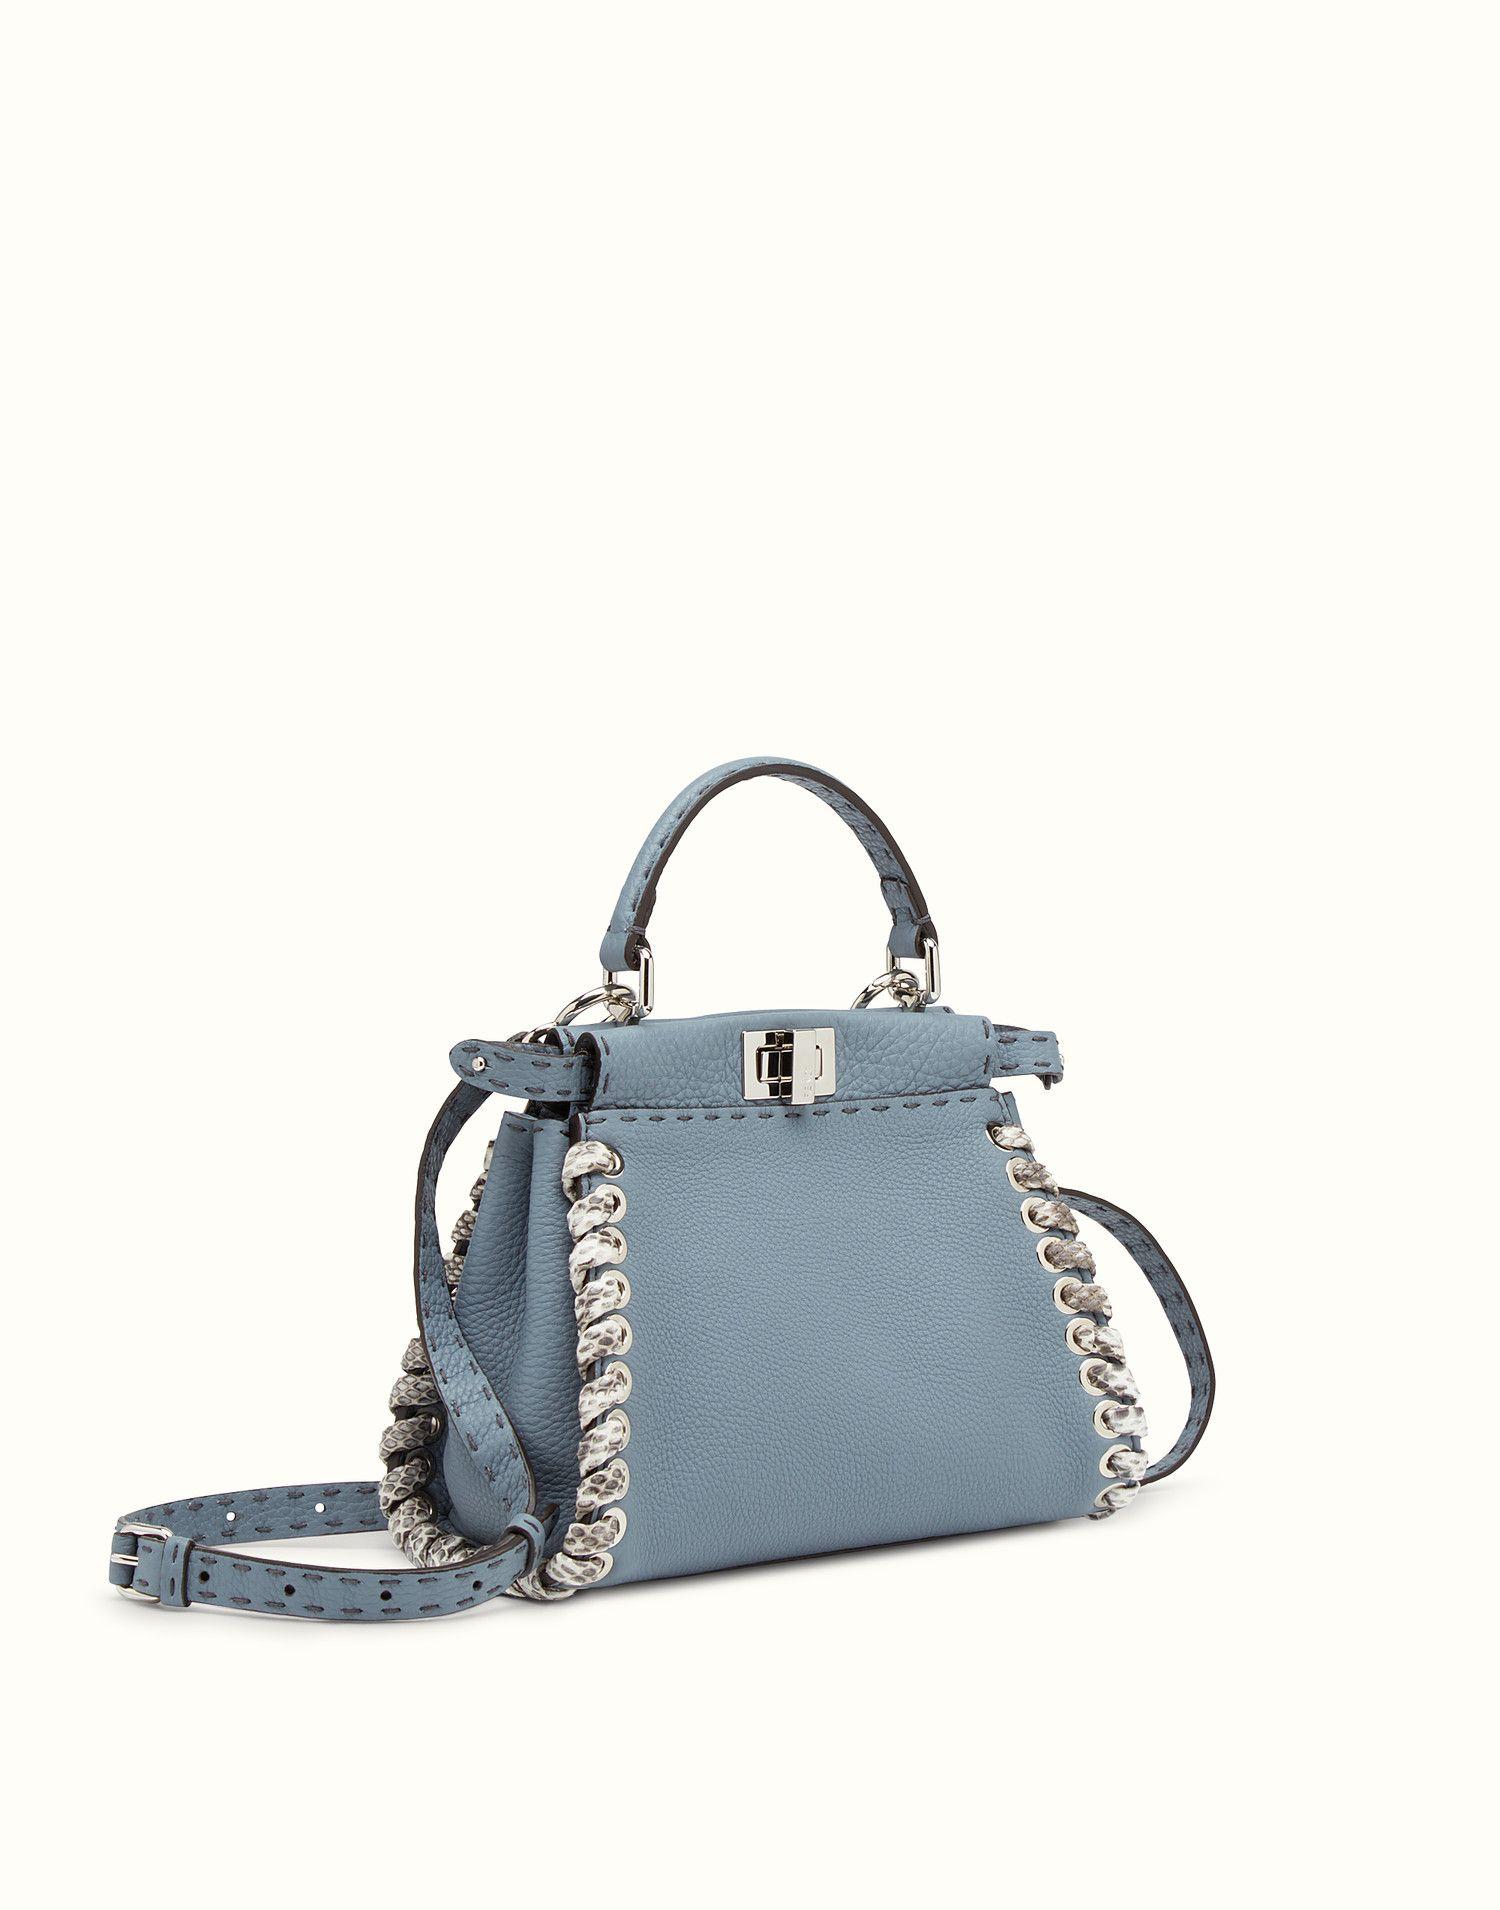 145d752375 FENDI PEEKABOO MINI - Light blue Selleria handbag with weave - view 2 zoom